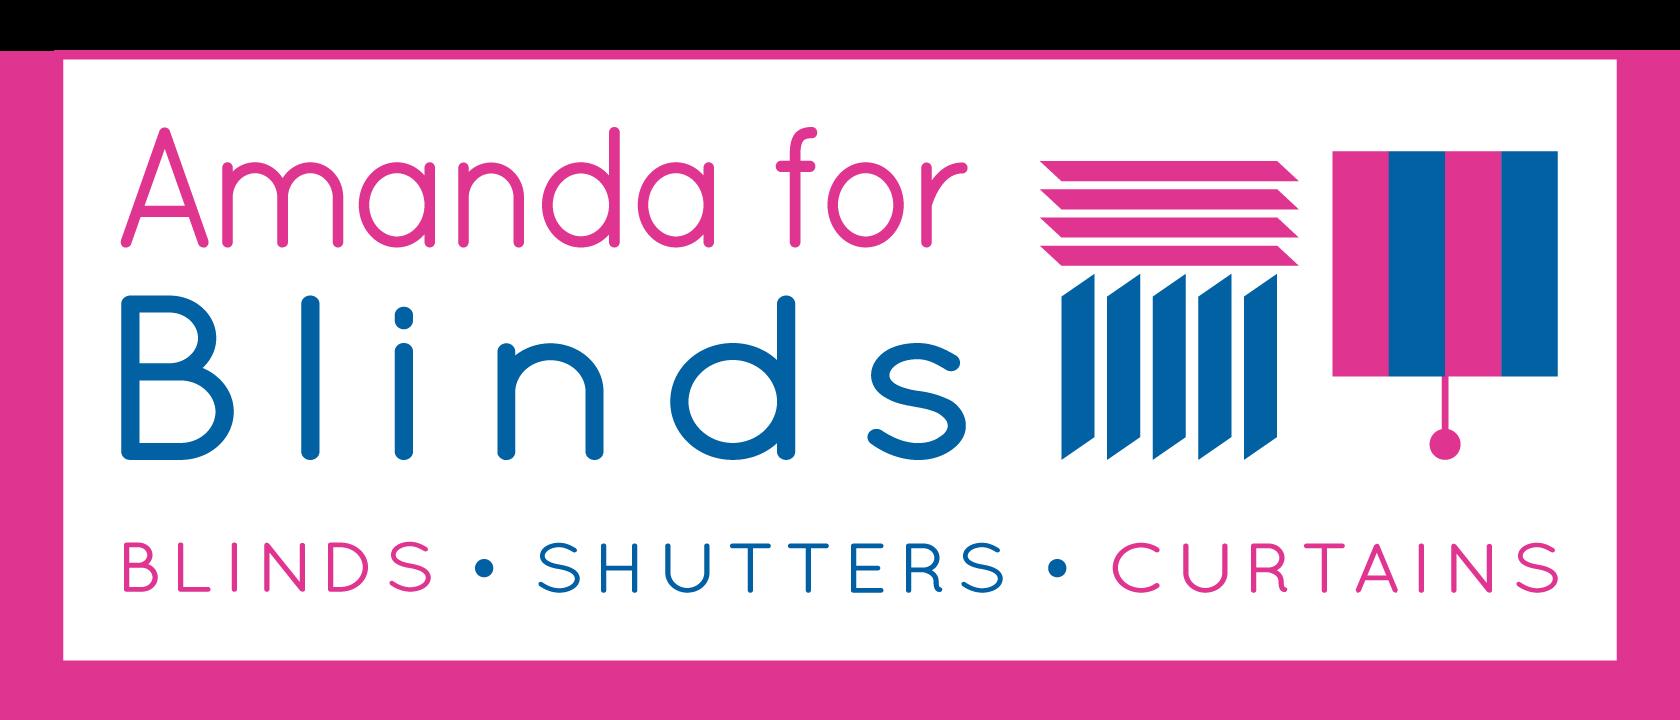 Amanda for Blinds